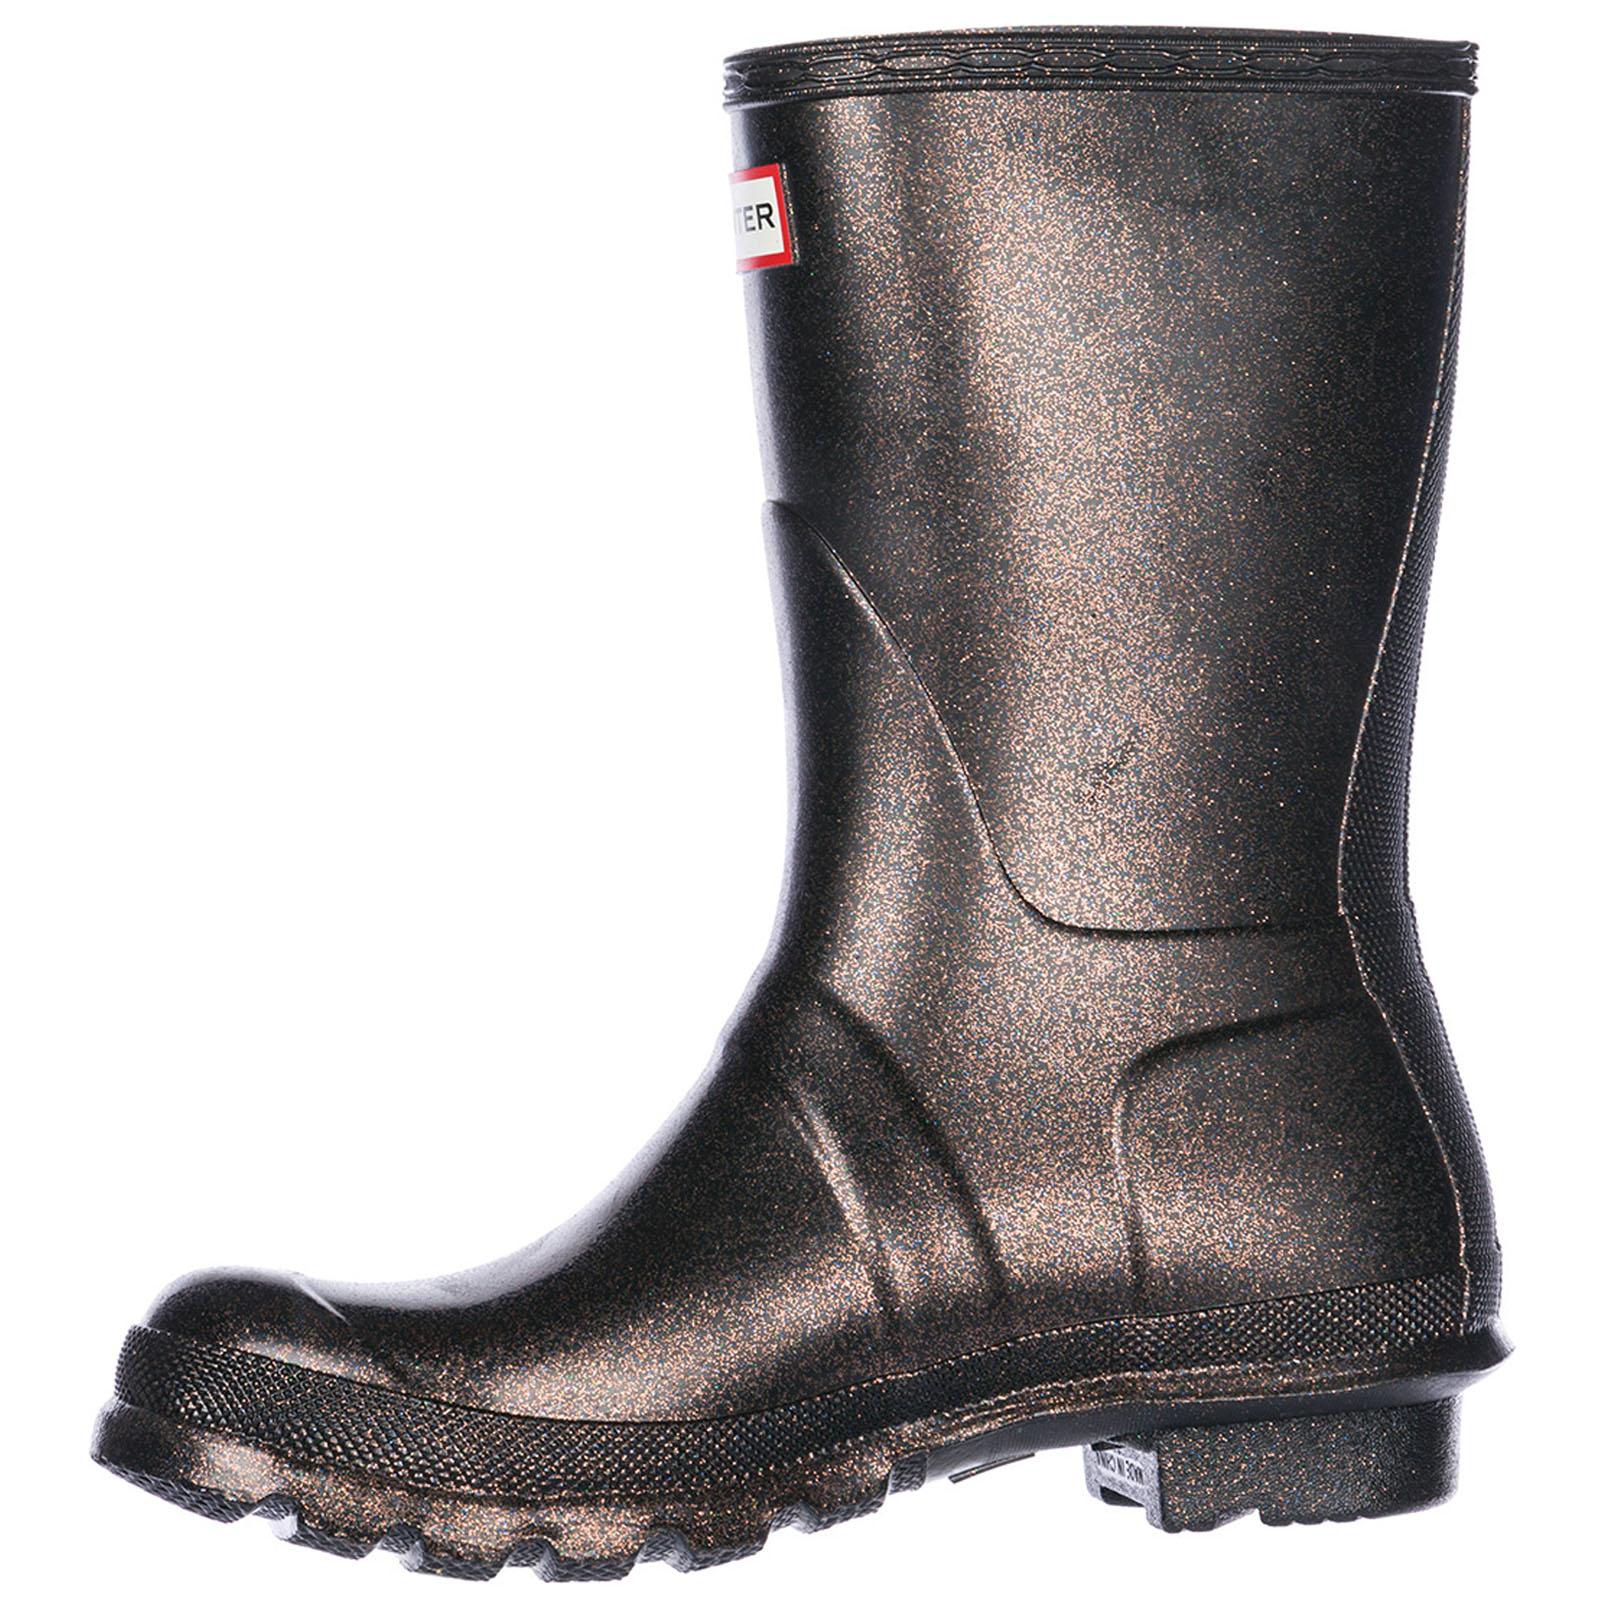 Gummi regen stiefel damen boots wellington short starcloud